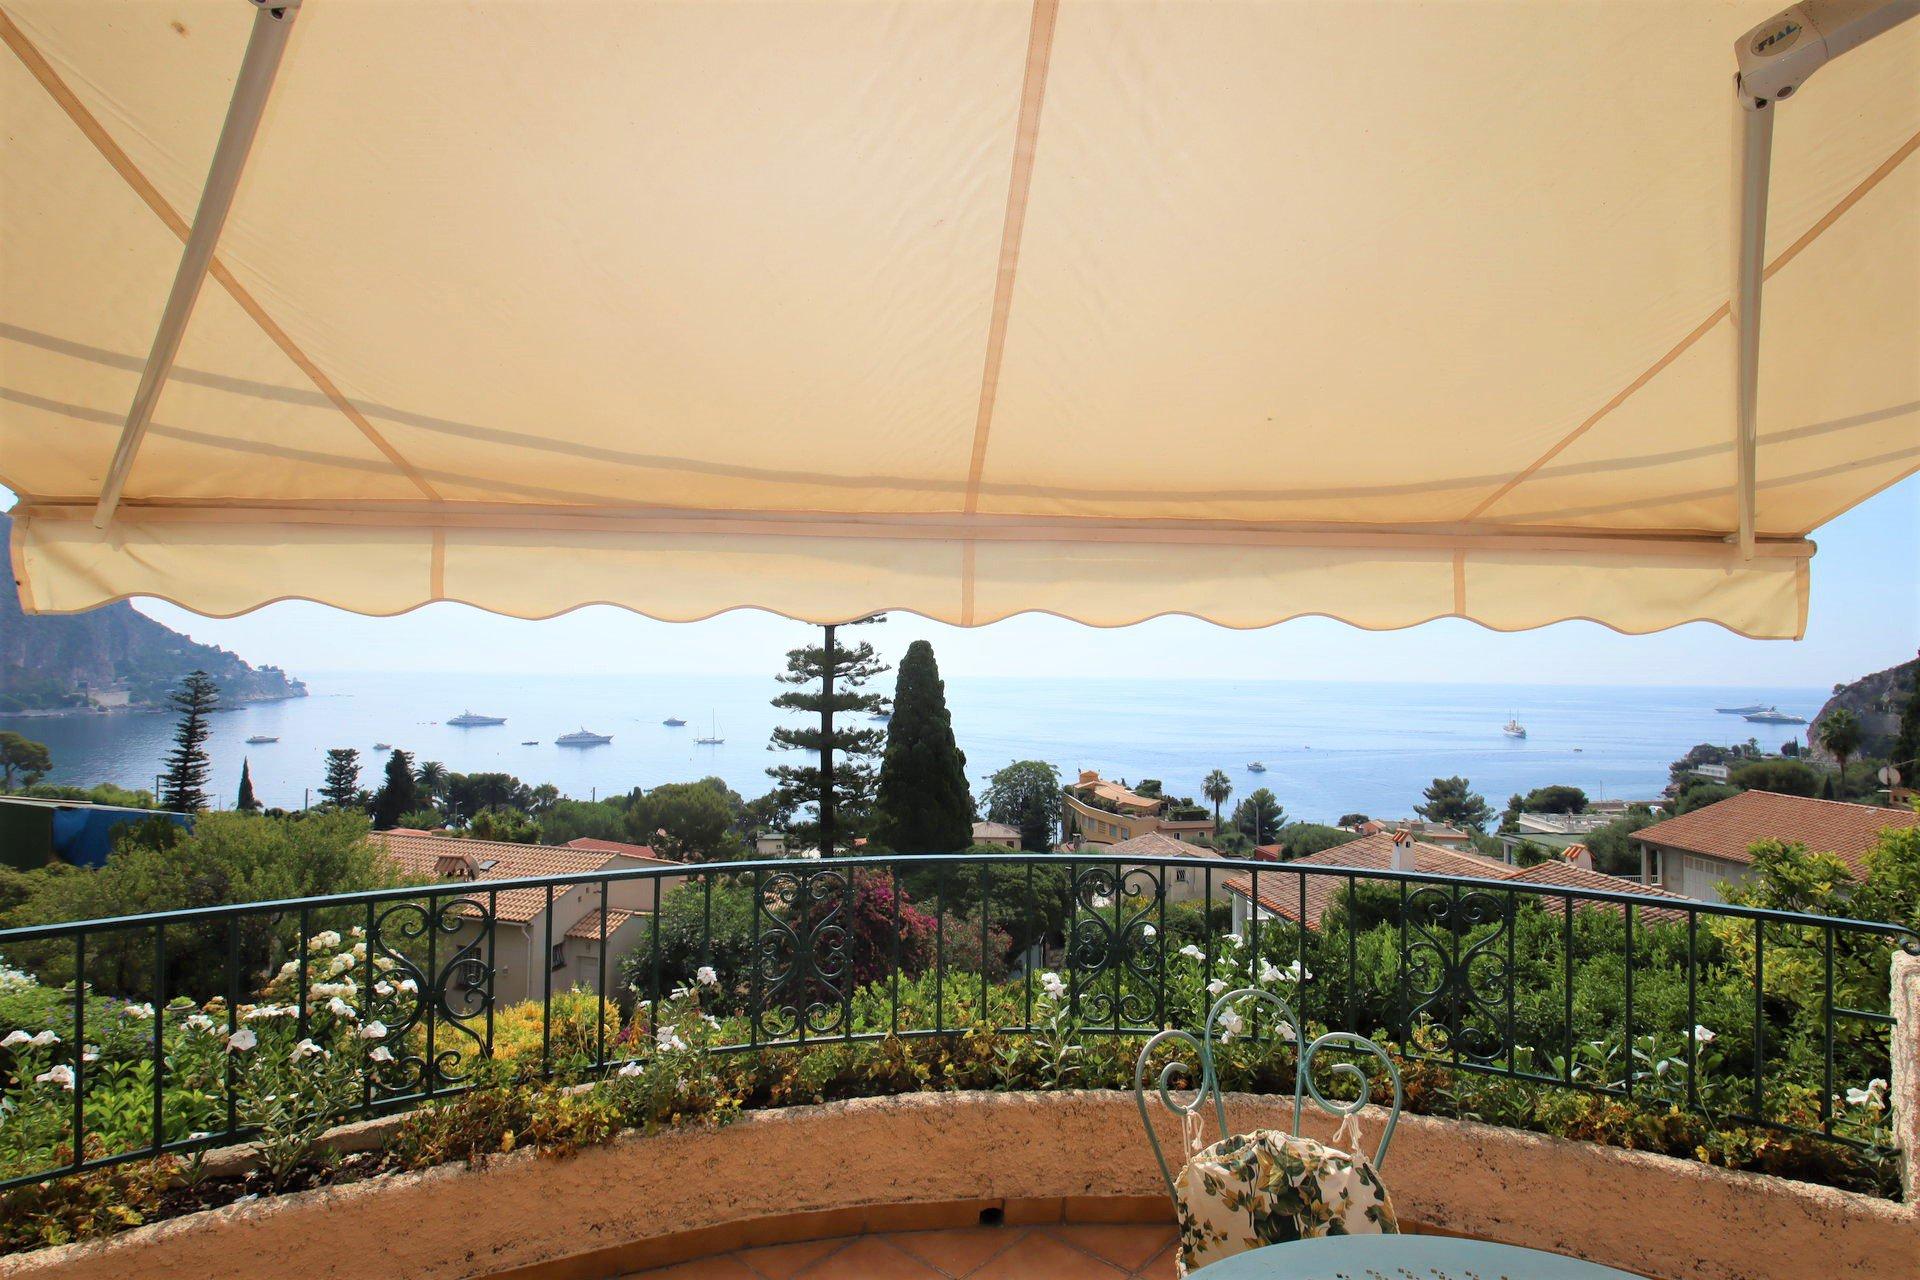 Eze bord de mer villa 200 m² vue panoramique terrasse